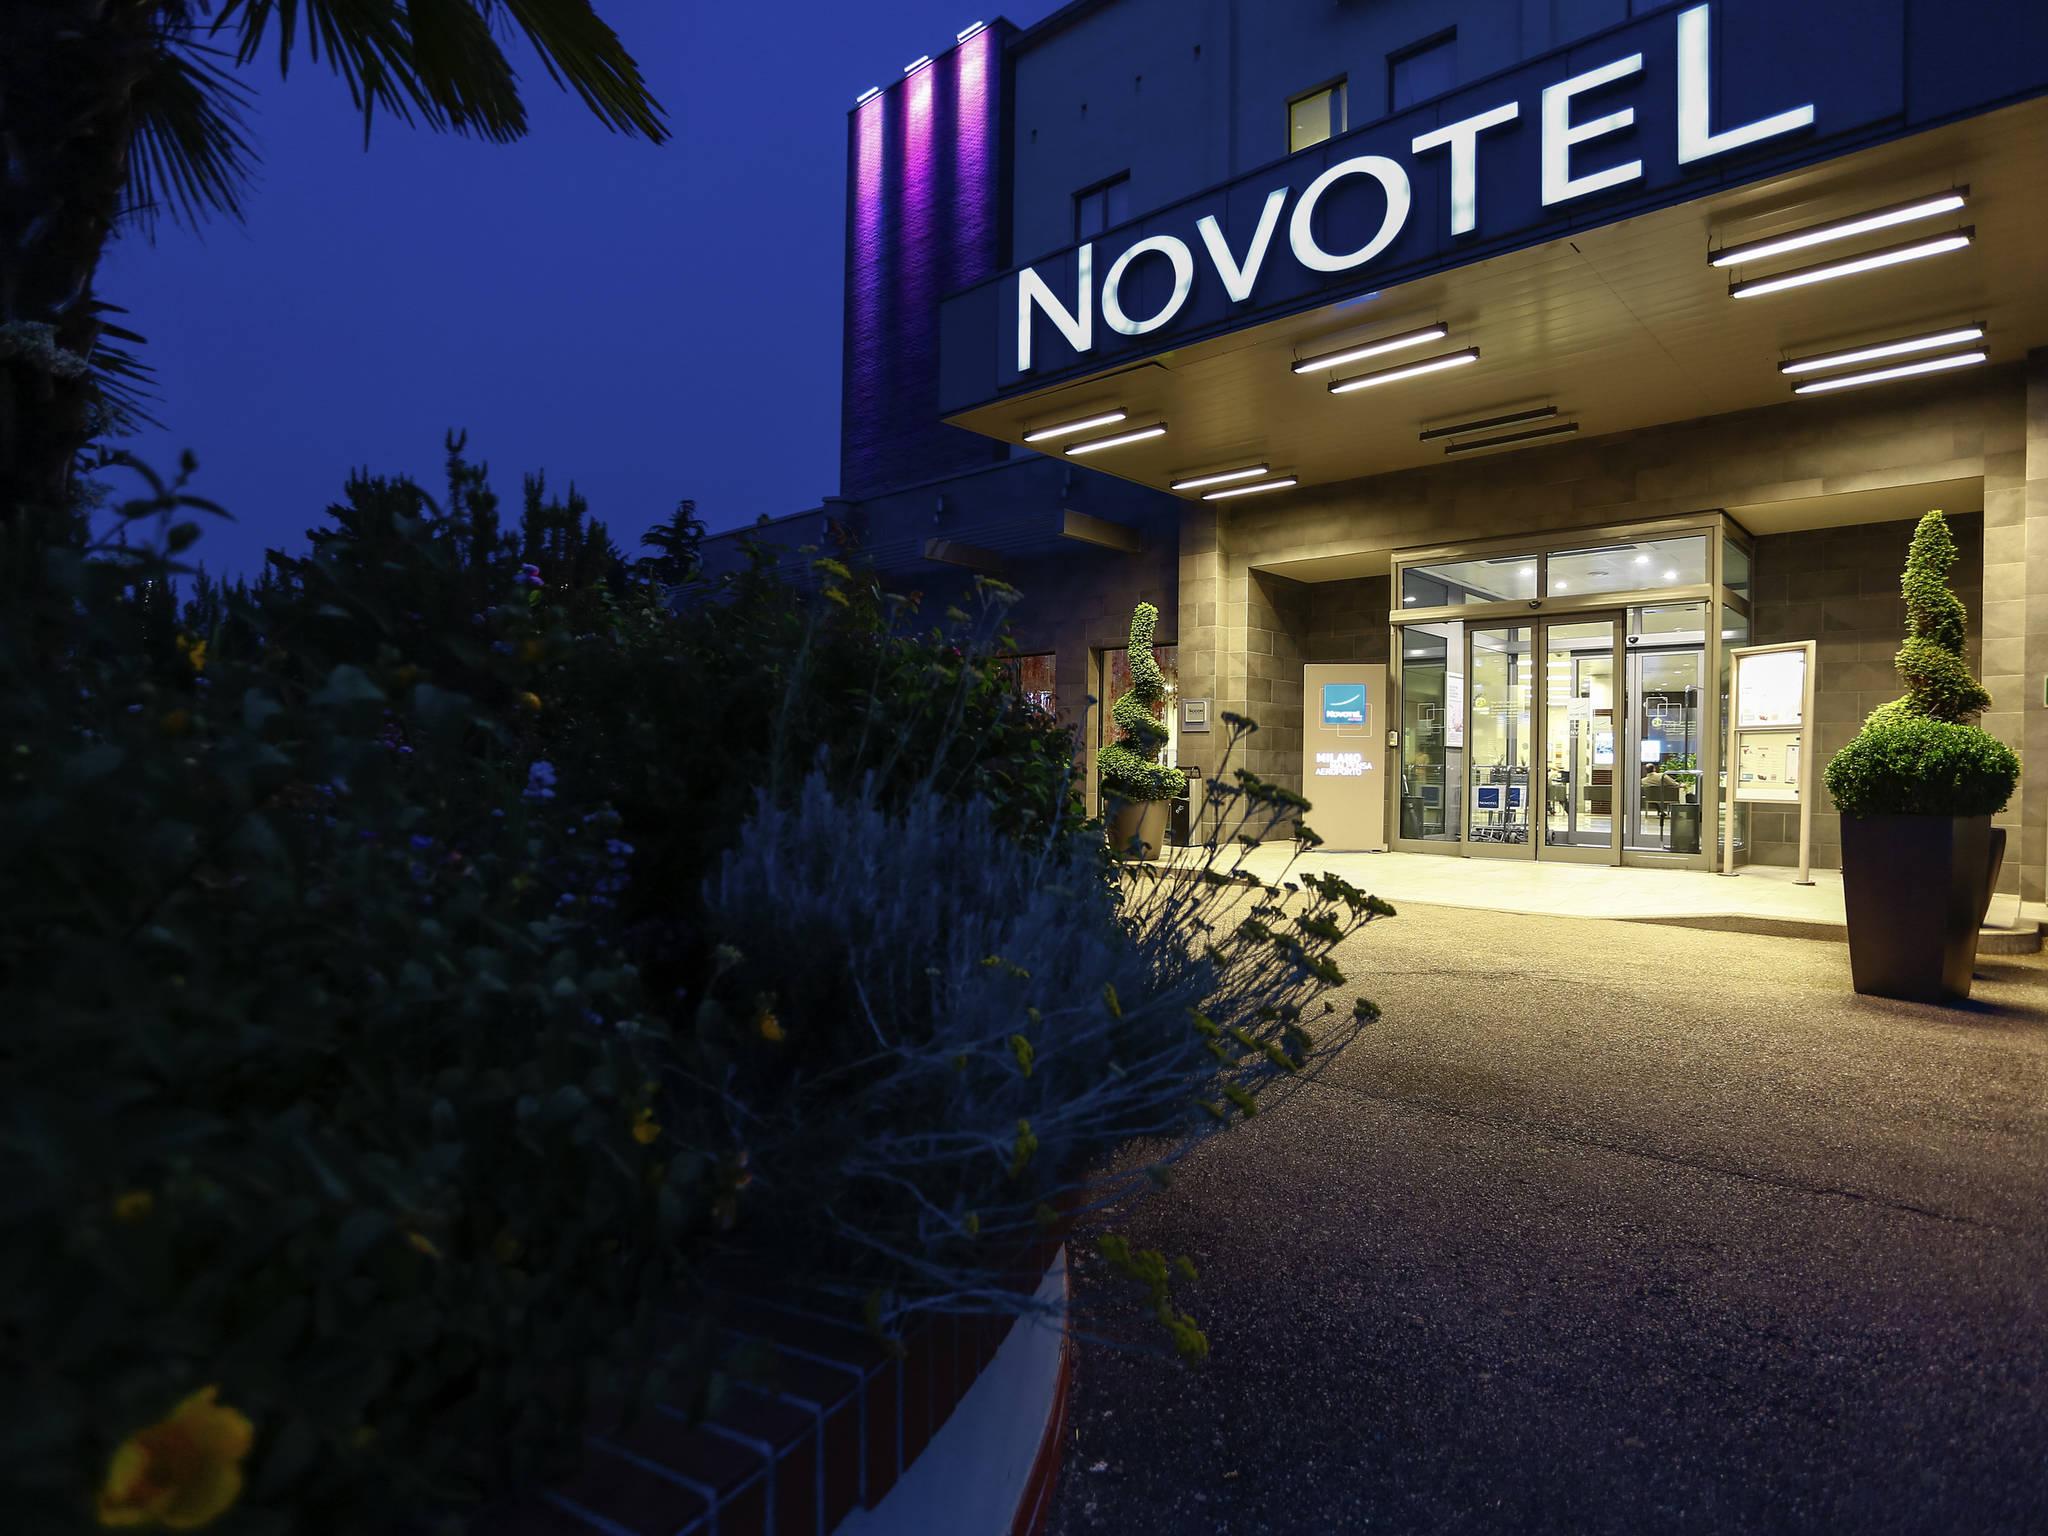 Hotel – Novotel Milano Malpensa Airport